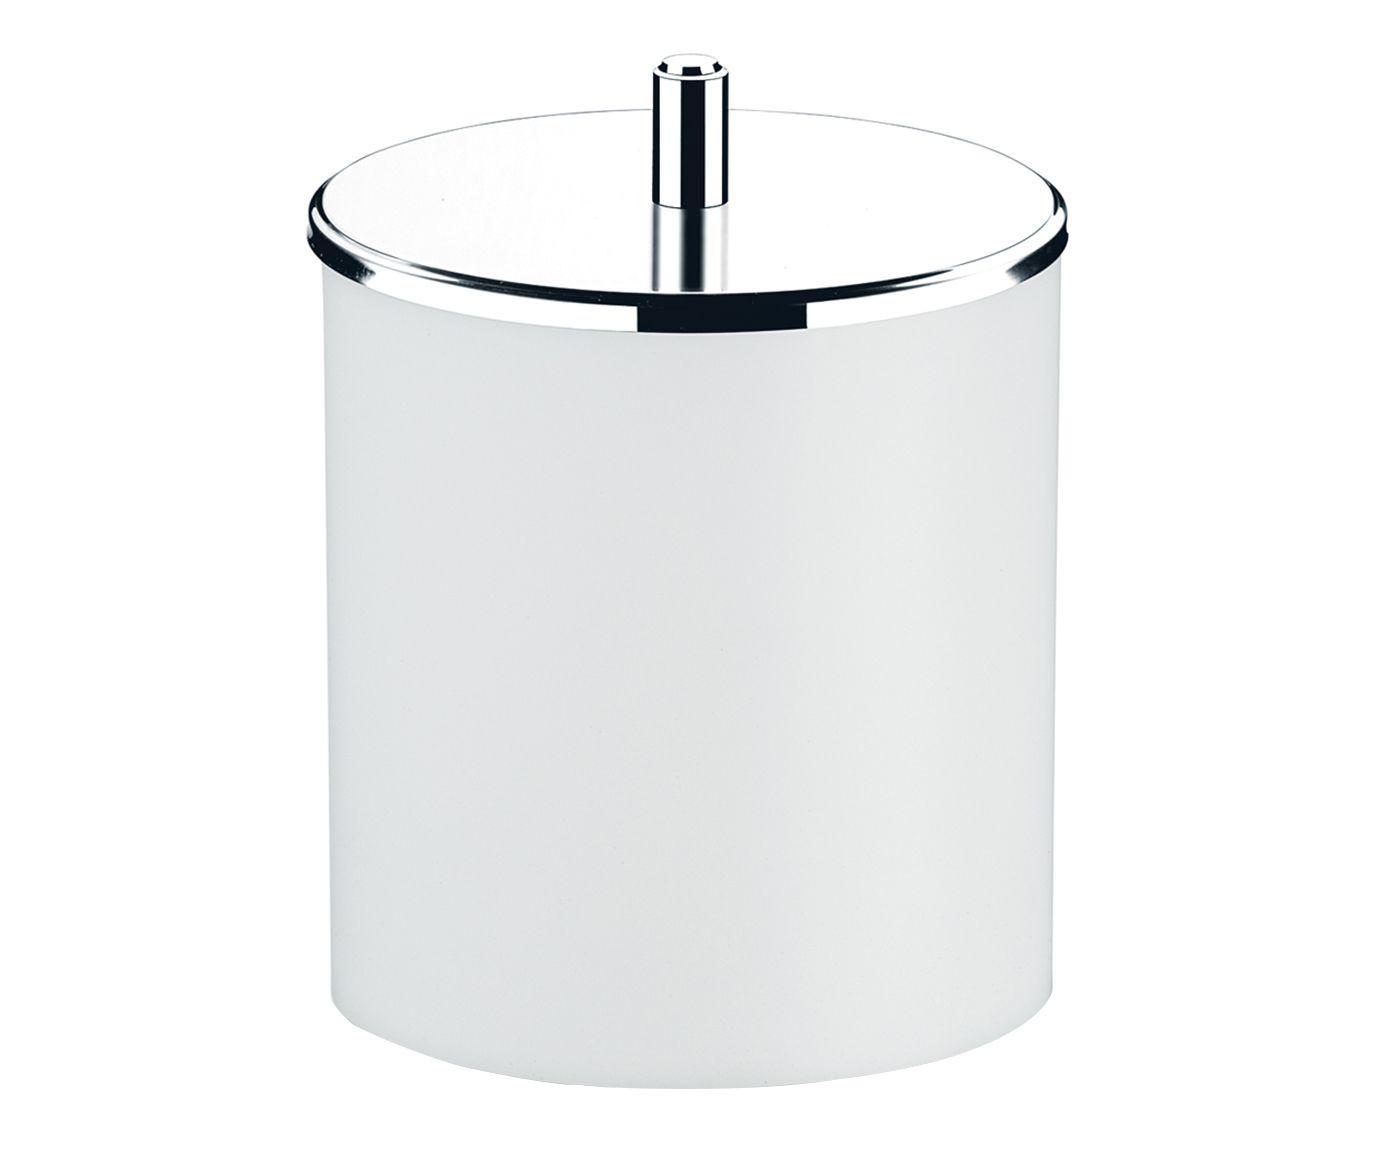 Lixeira em Inox Bolvadin Branca - 19cm | Westwing.com.br